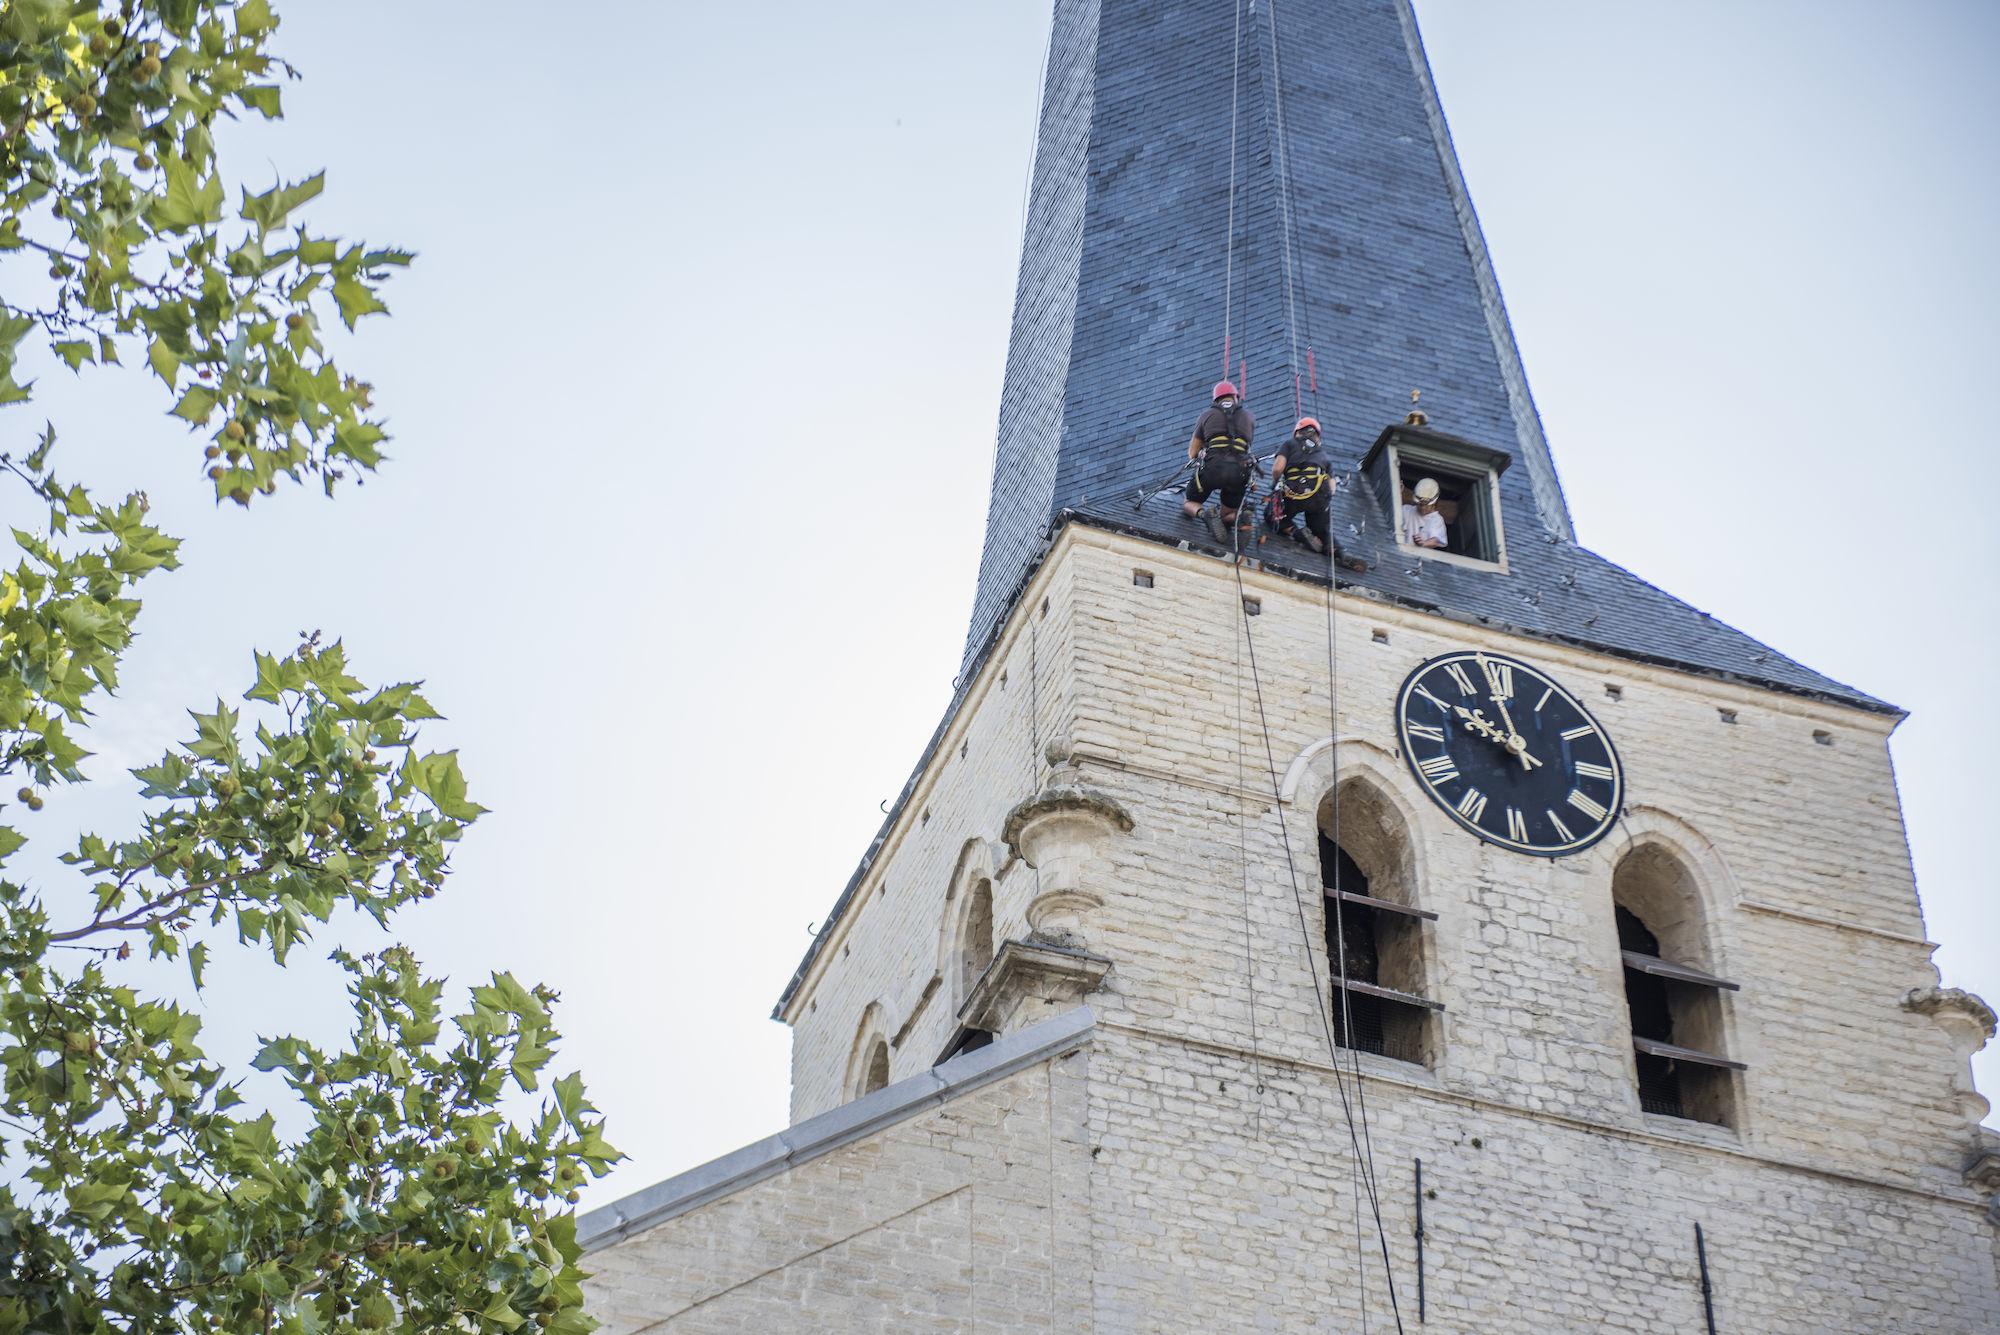 170823-Monumentenwacht-Kerk-Hamme-6.jpg